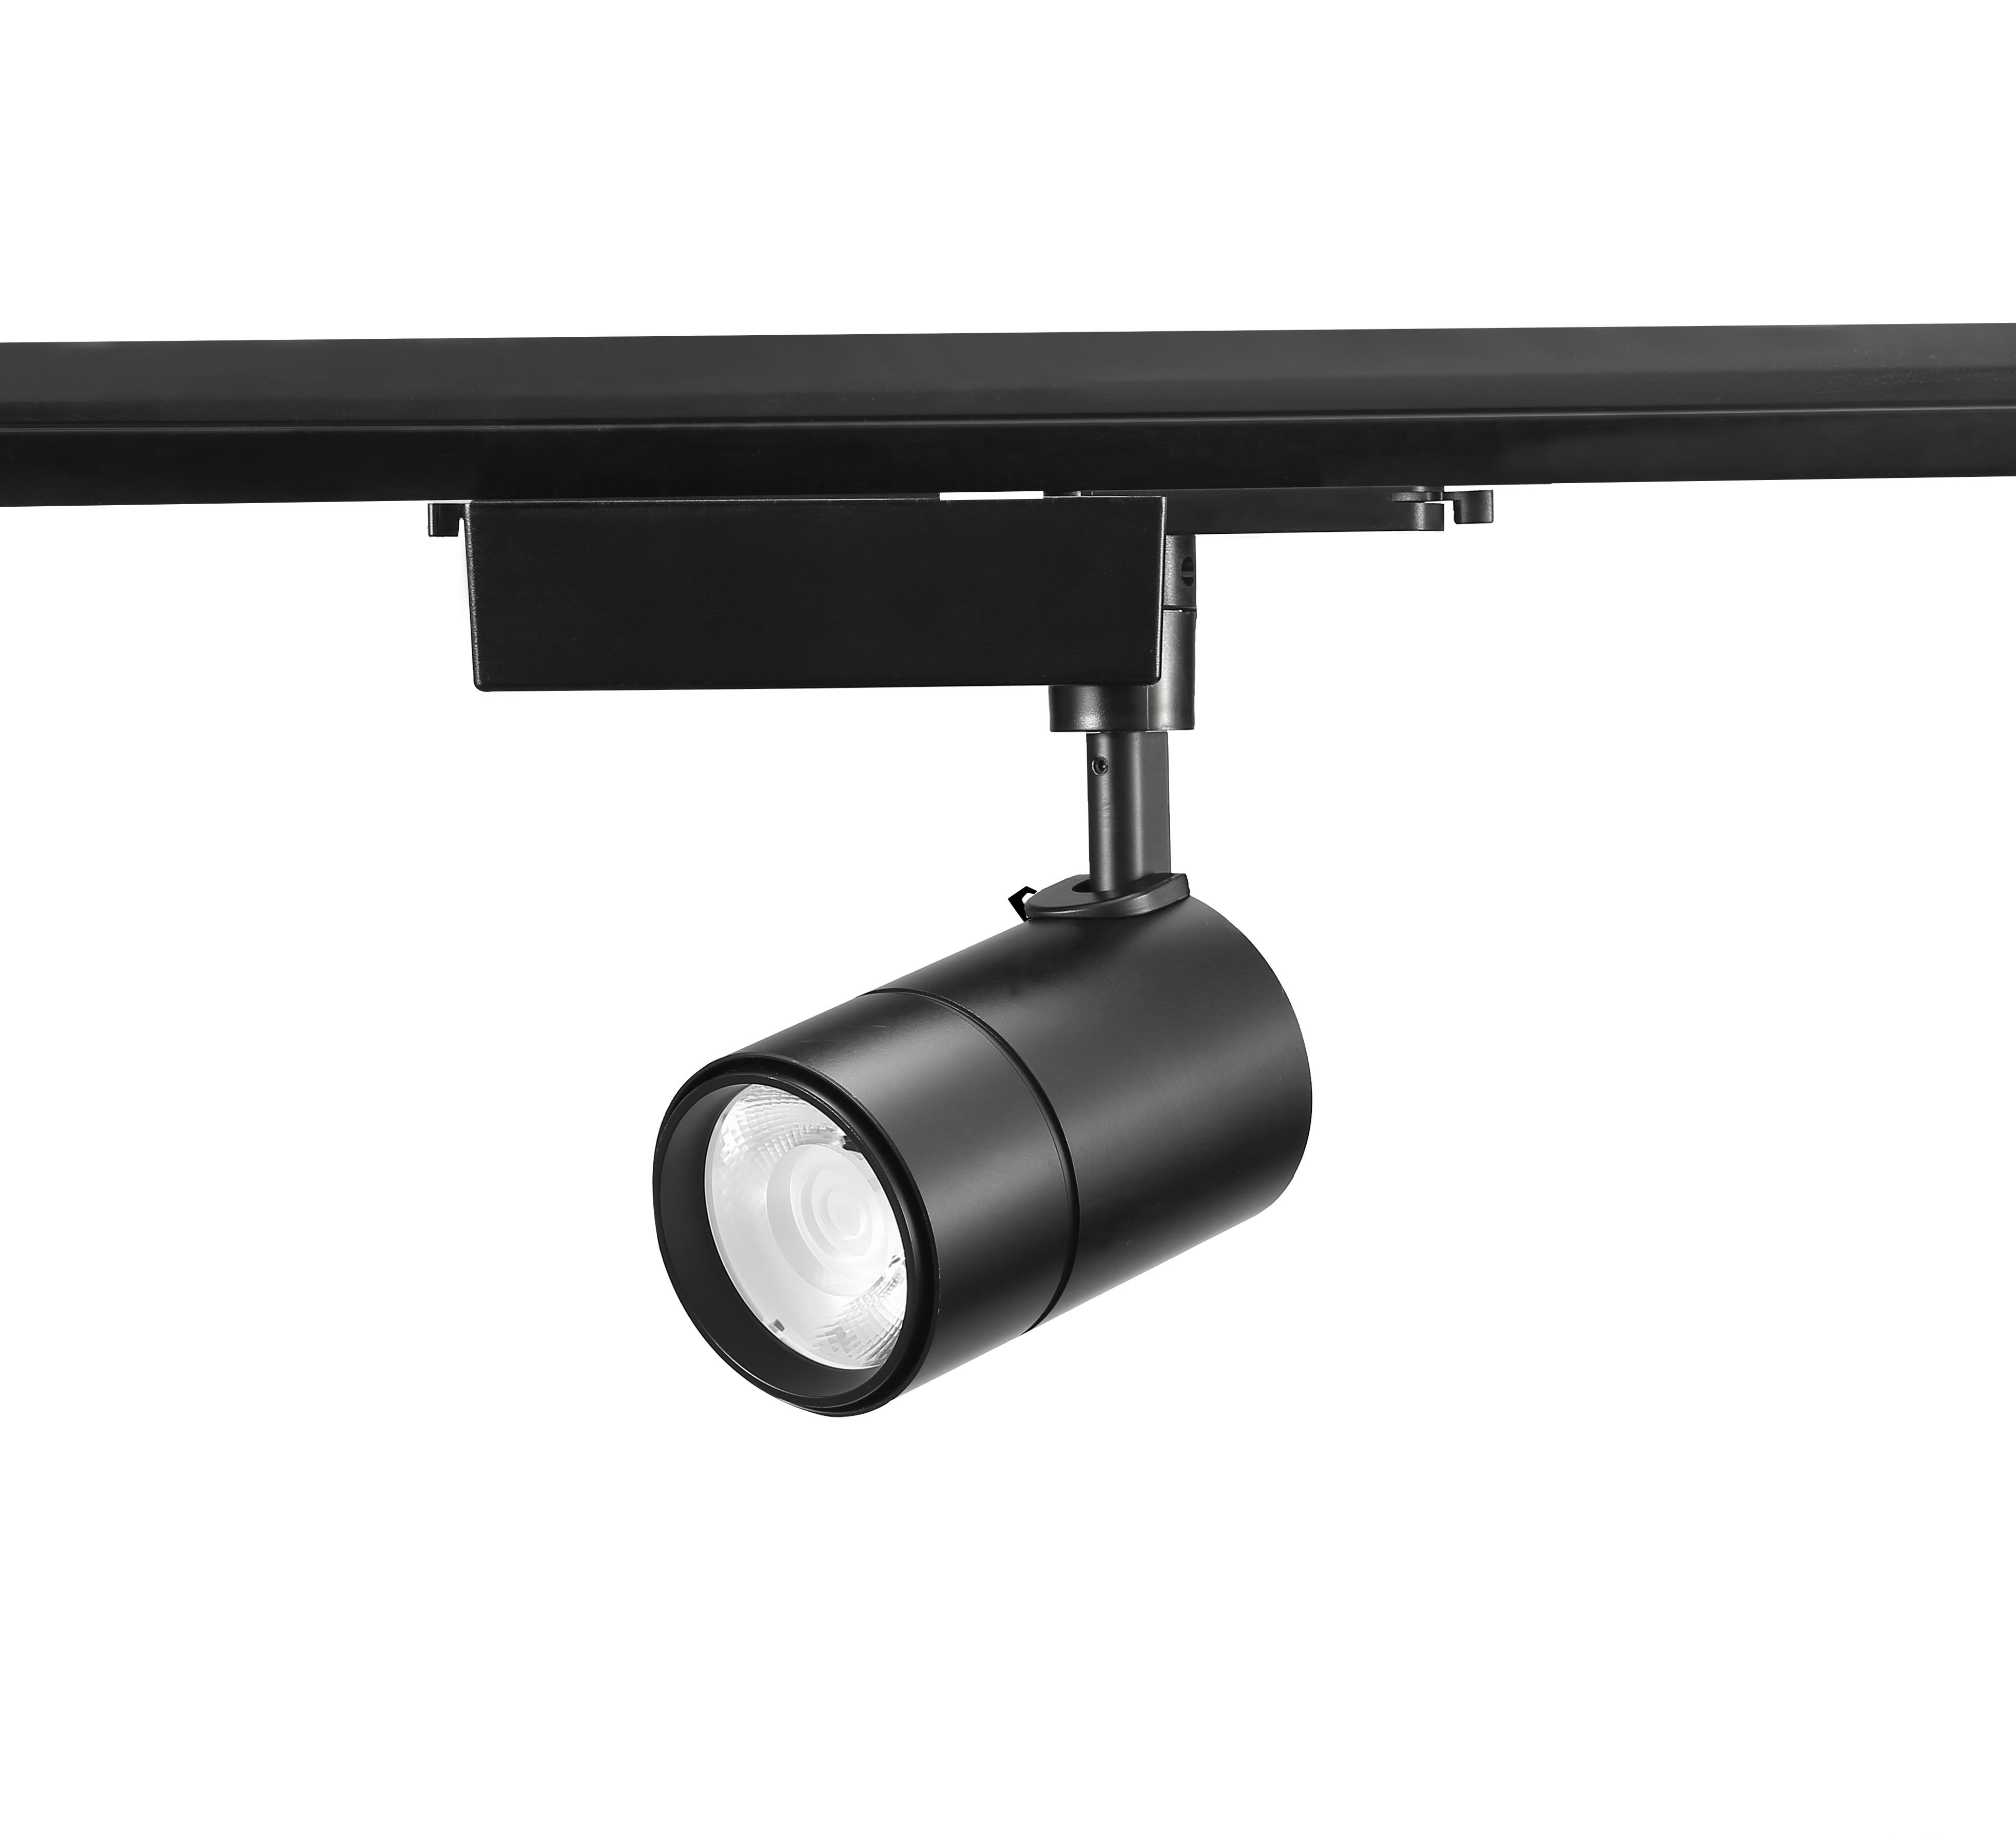 LED tracklight 25W side